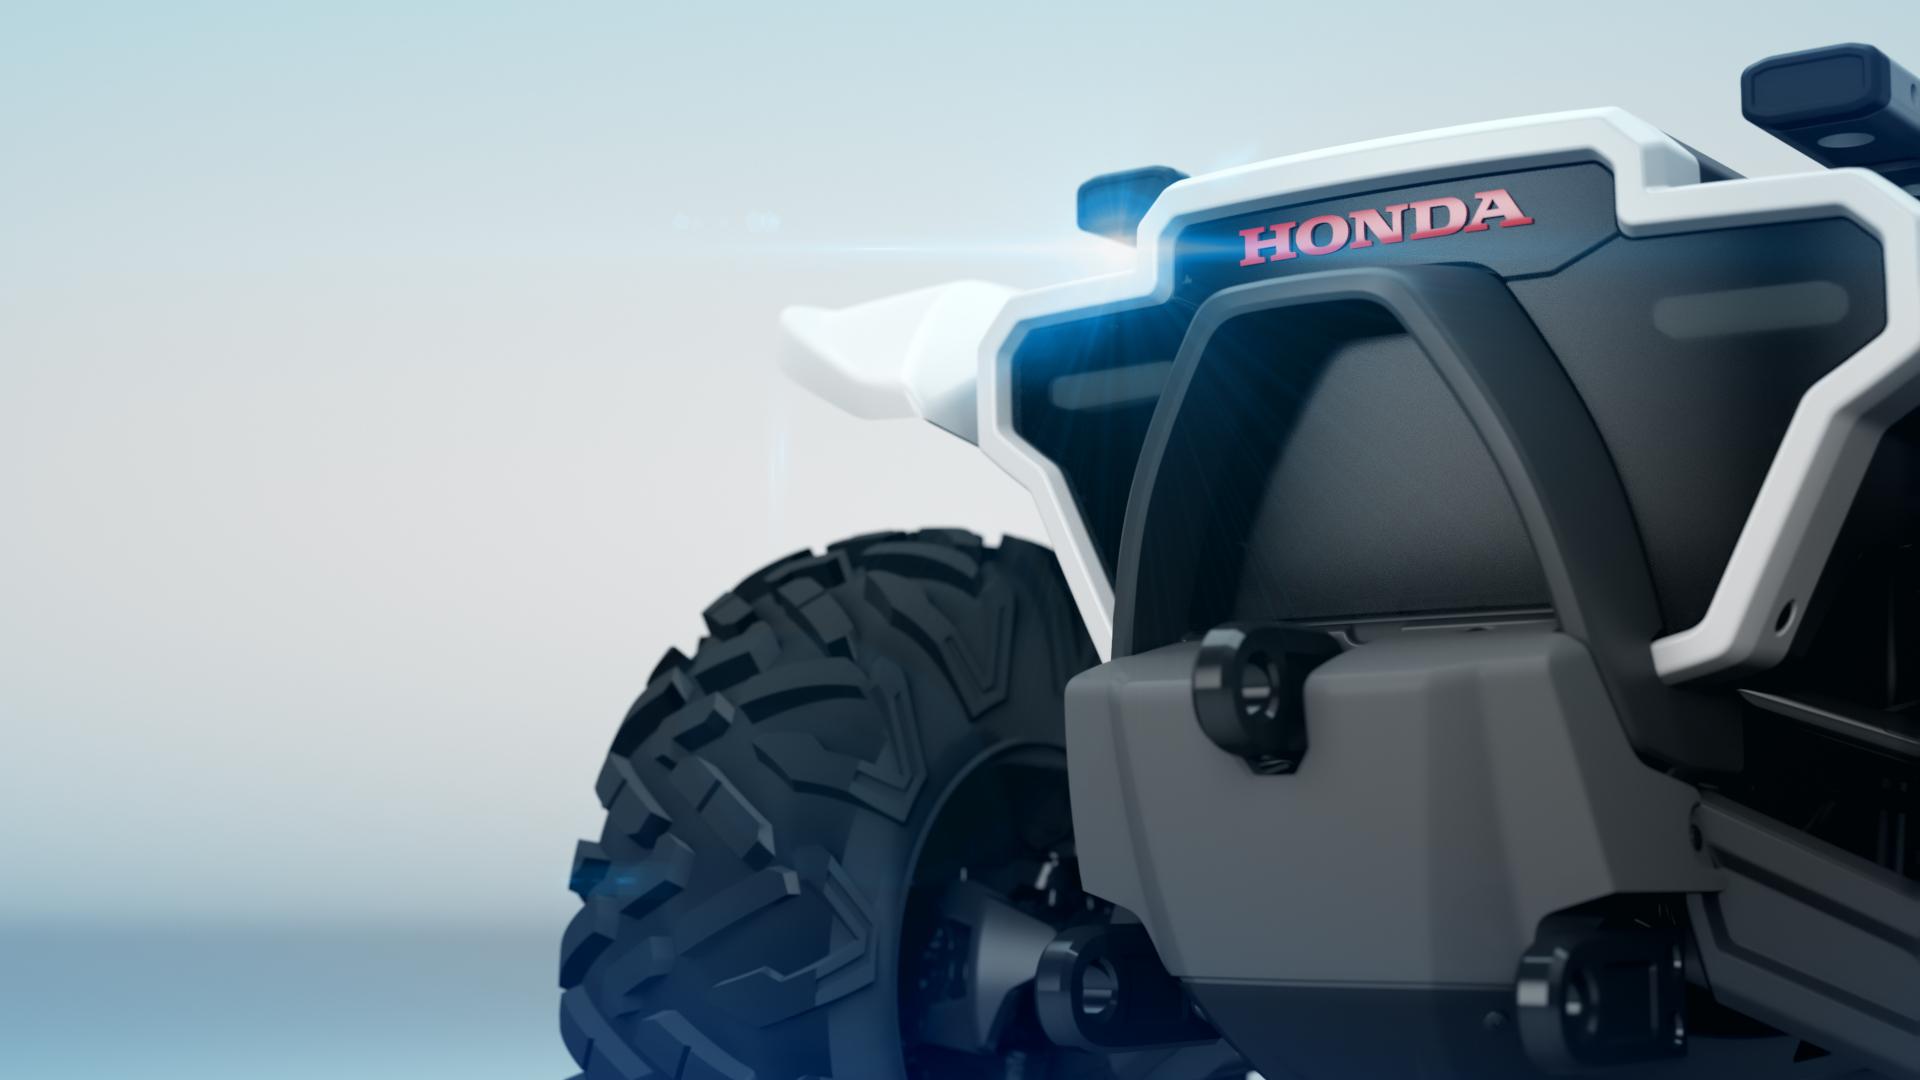 2018 Honda 3E-D18 concept